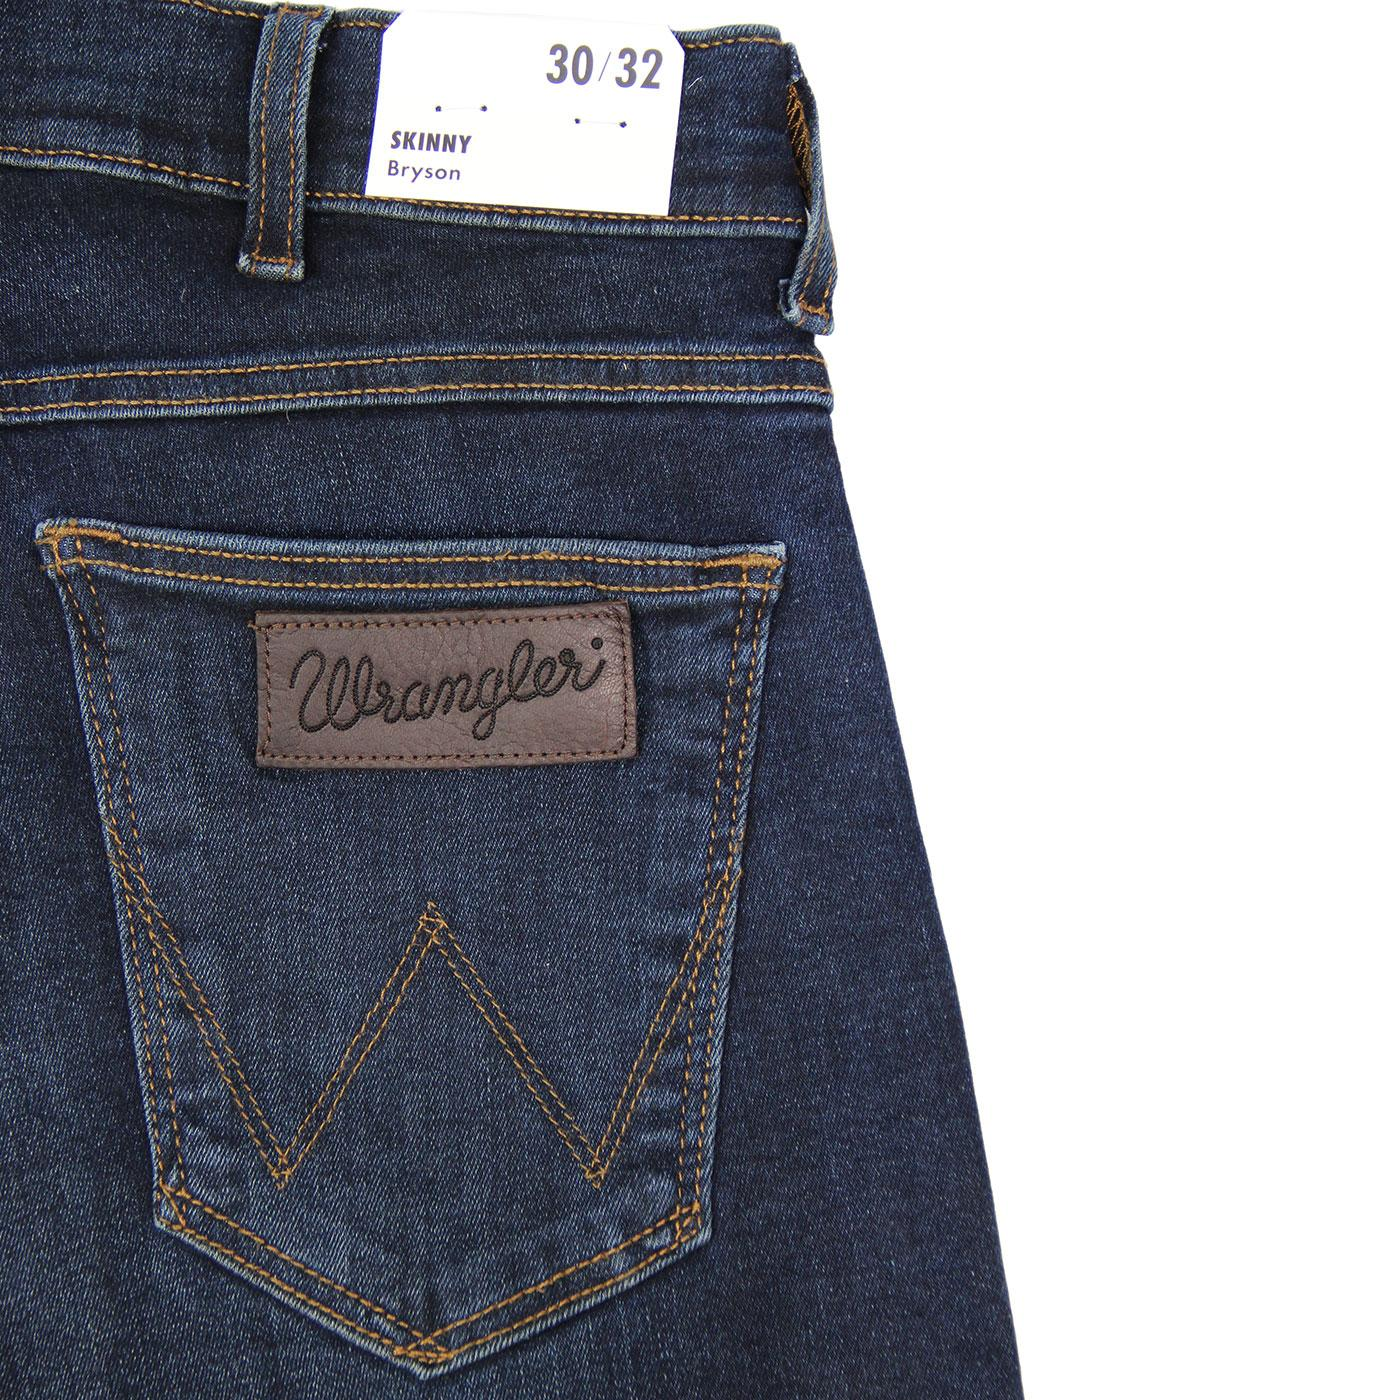 8d6e55f3 WRANGLER Bryson Retro Mod Skinny Denim Jeans Dust Blue